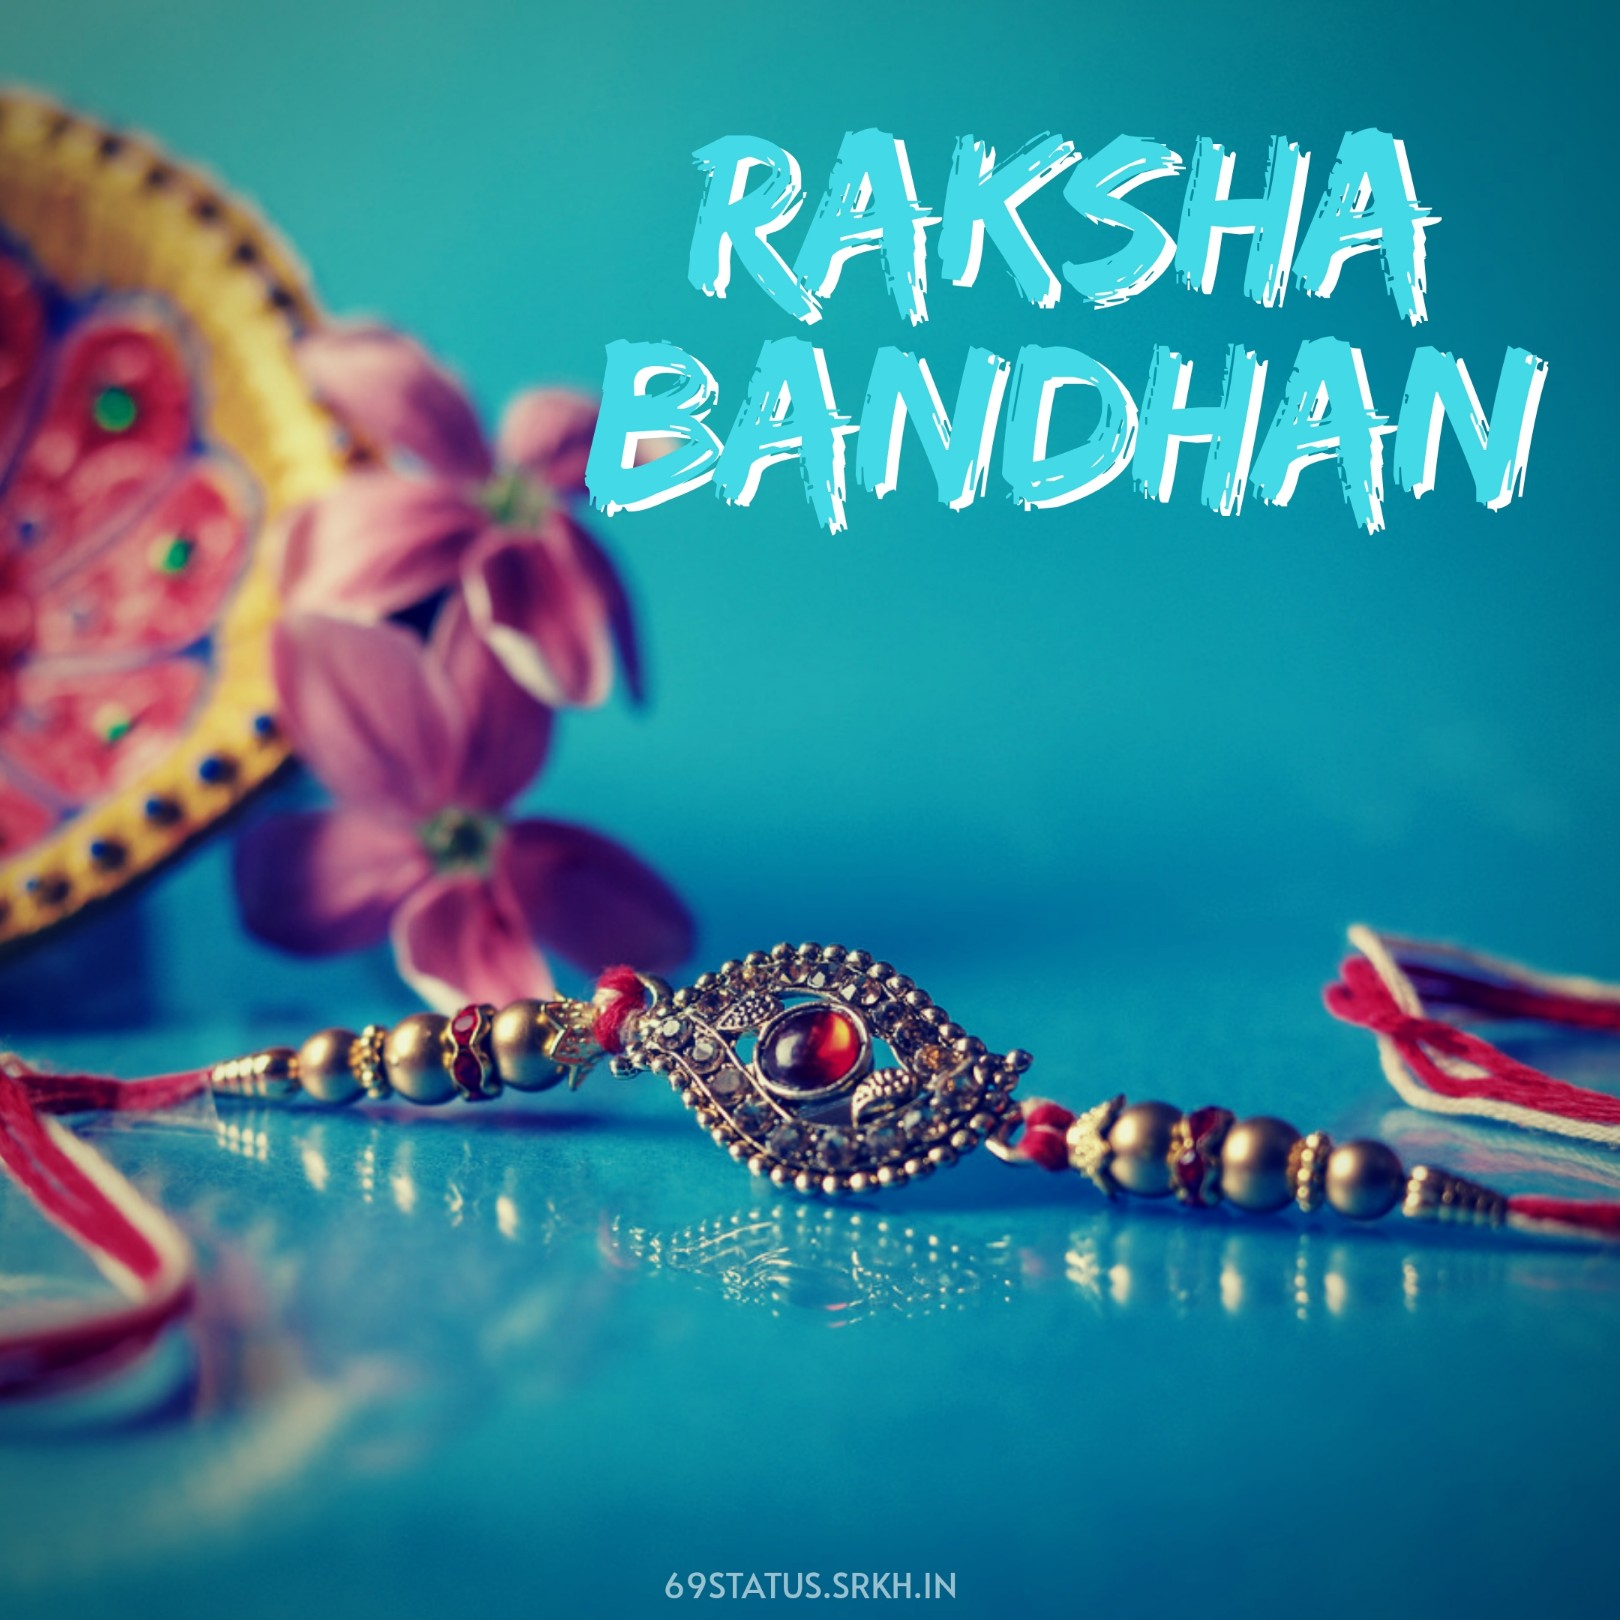 Raksha Bandhan Picture Images Facebook full HD free download.